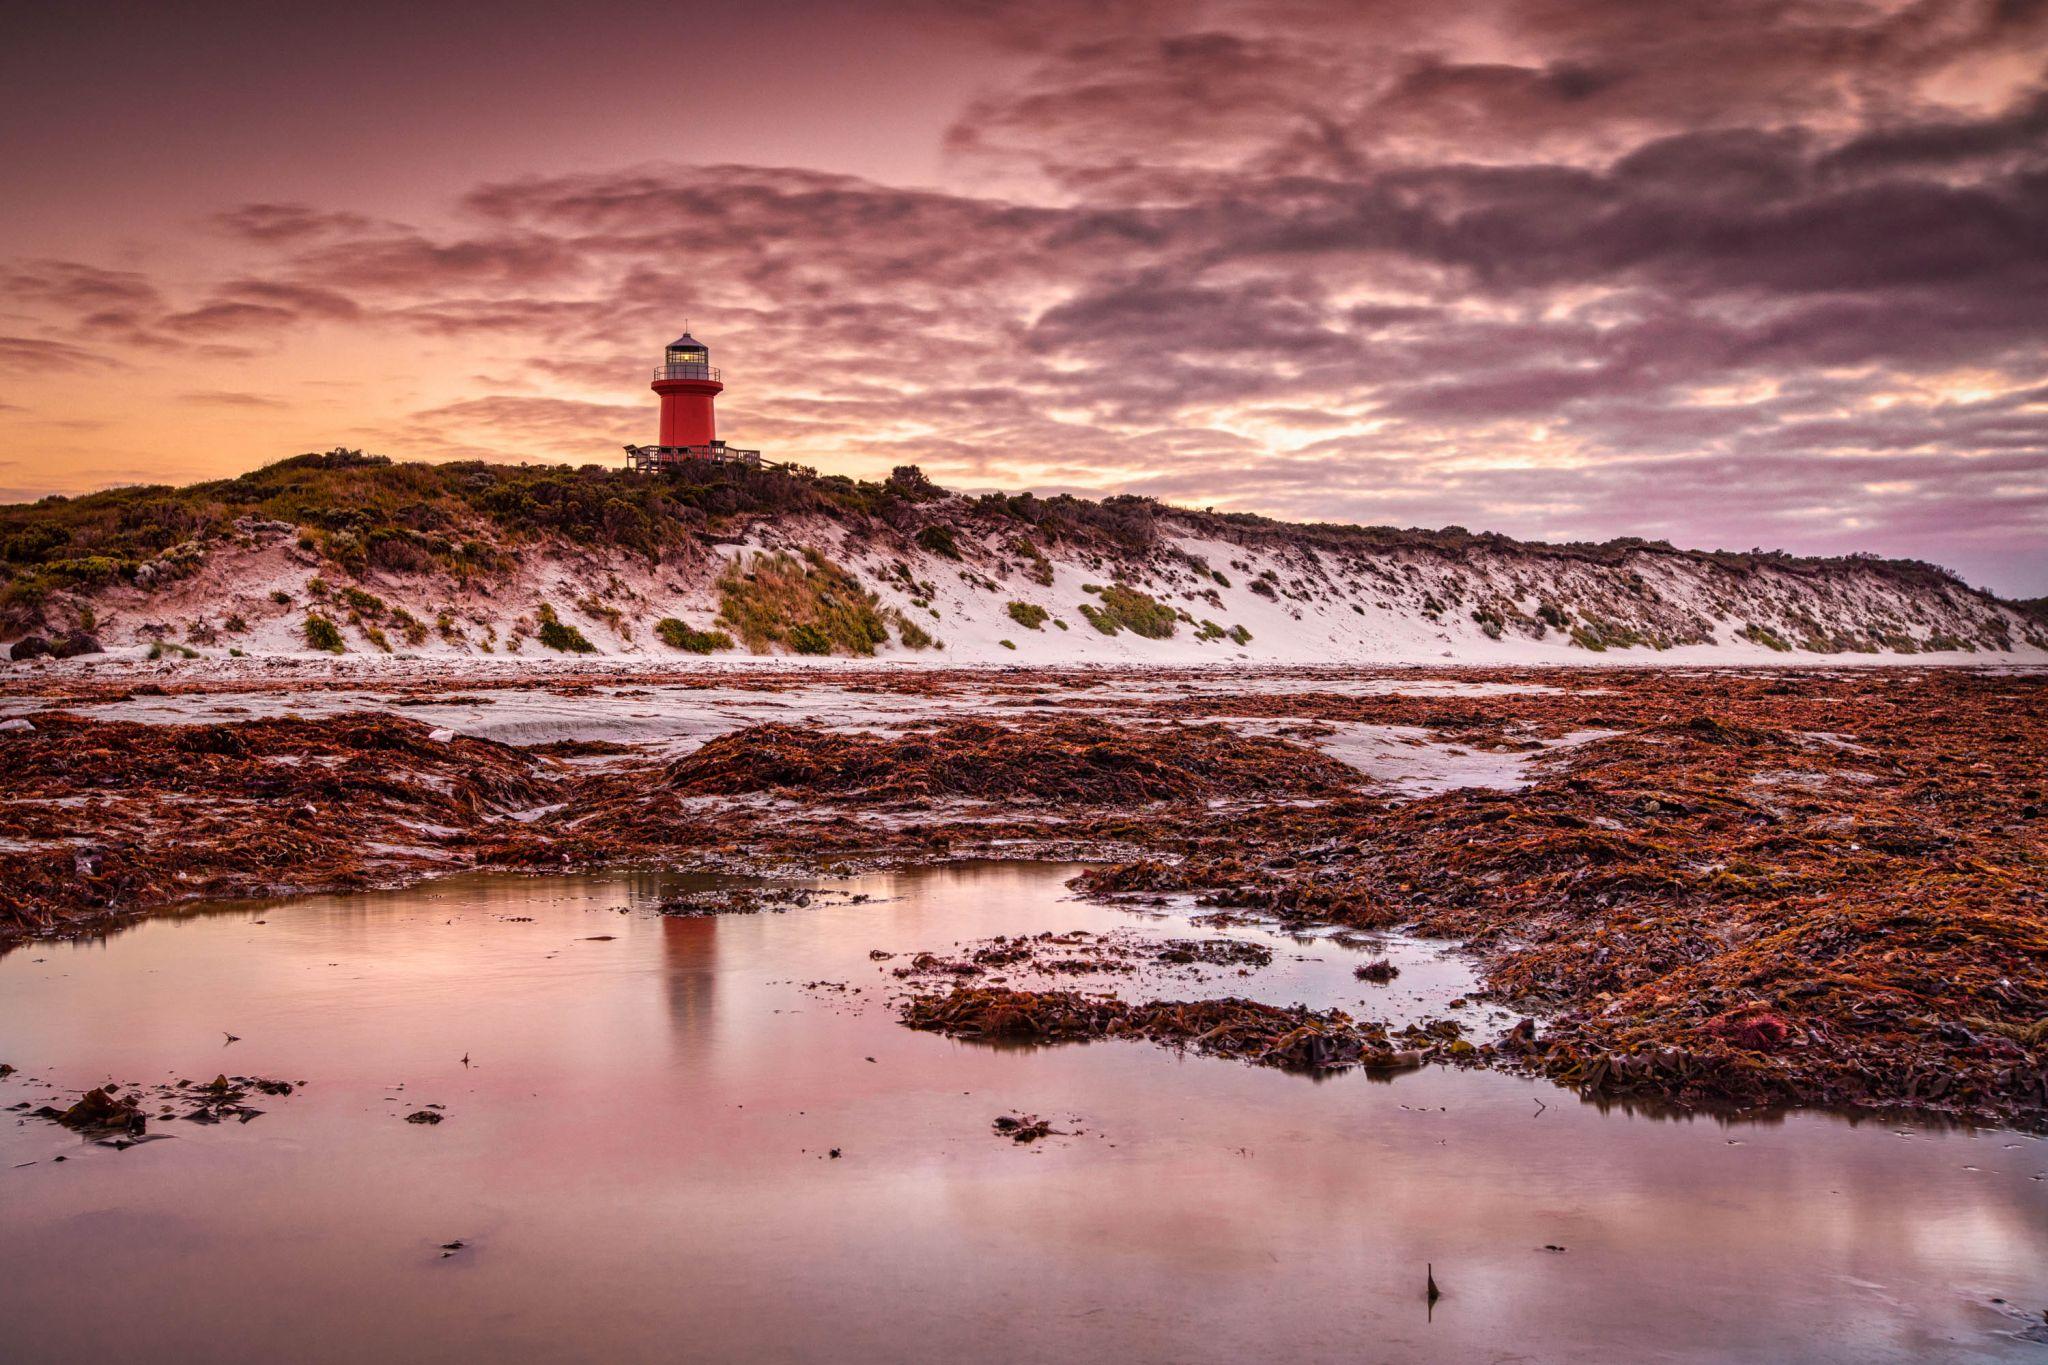 Cape Banks Lighthouse reflection ,South Australia, Australia